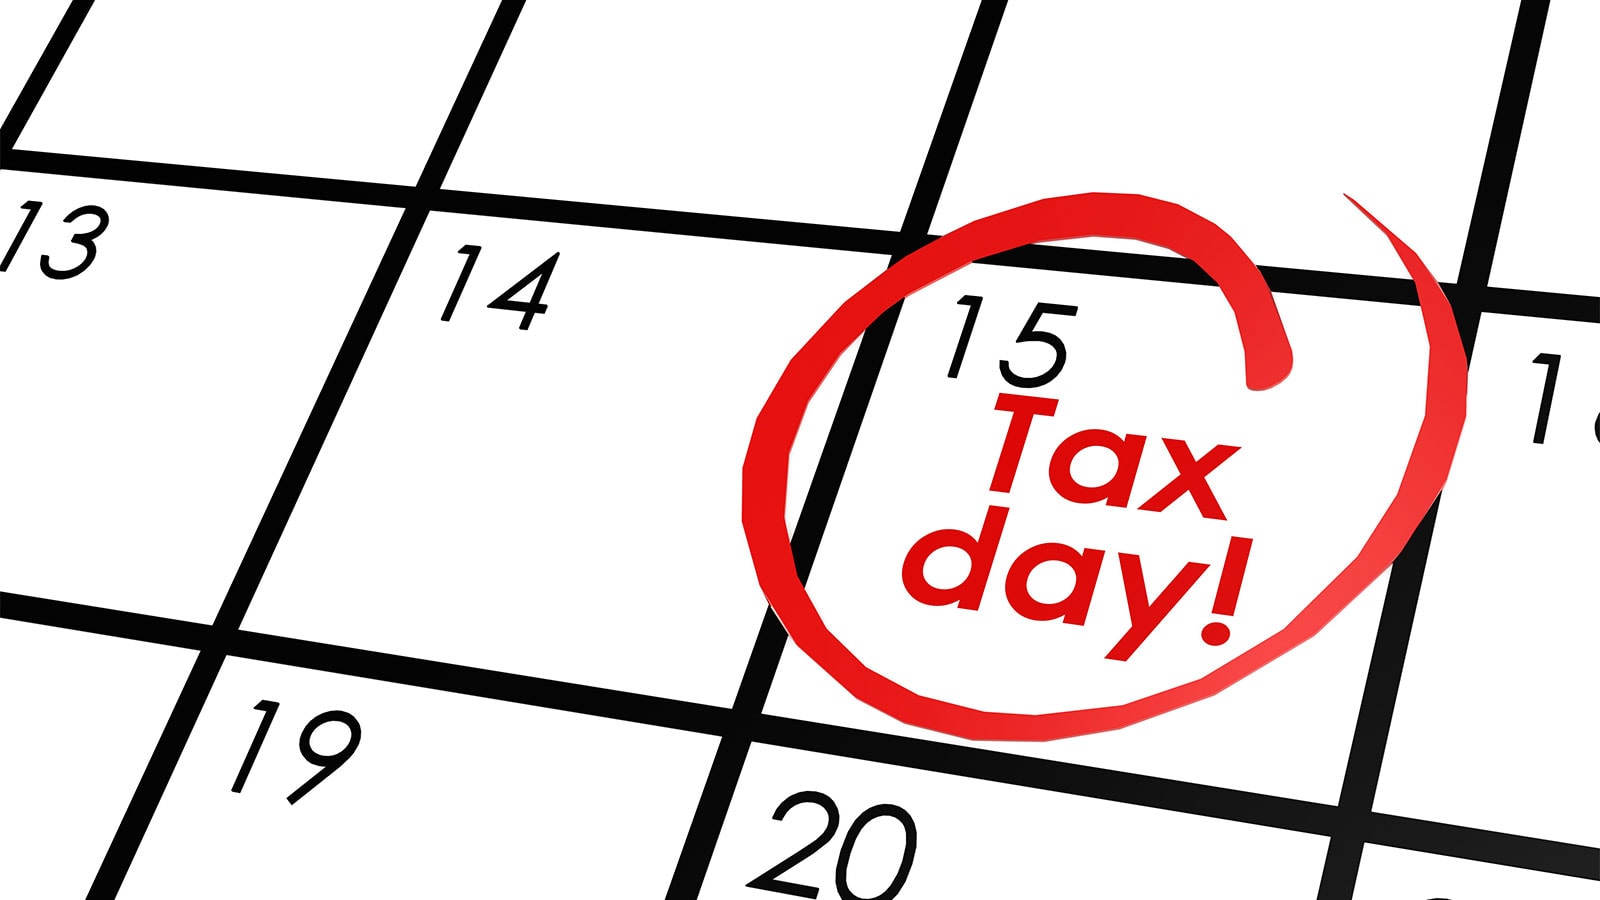 Eddy & Schein can help you organize for tax preparation.